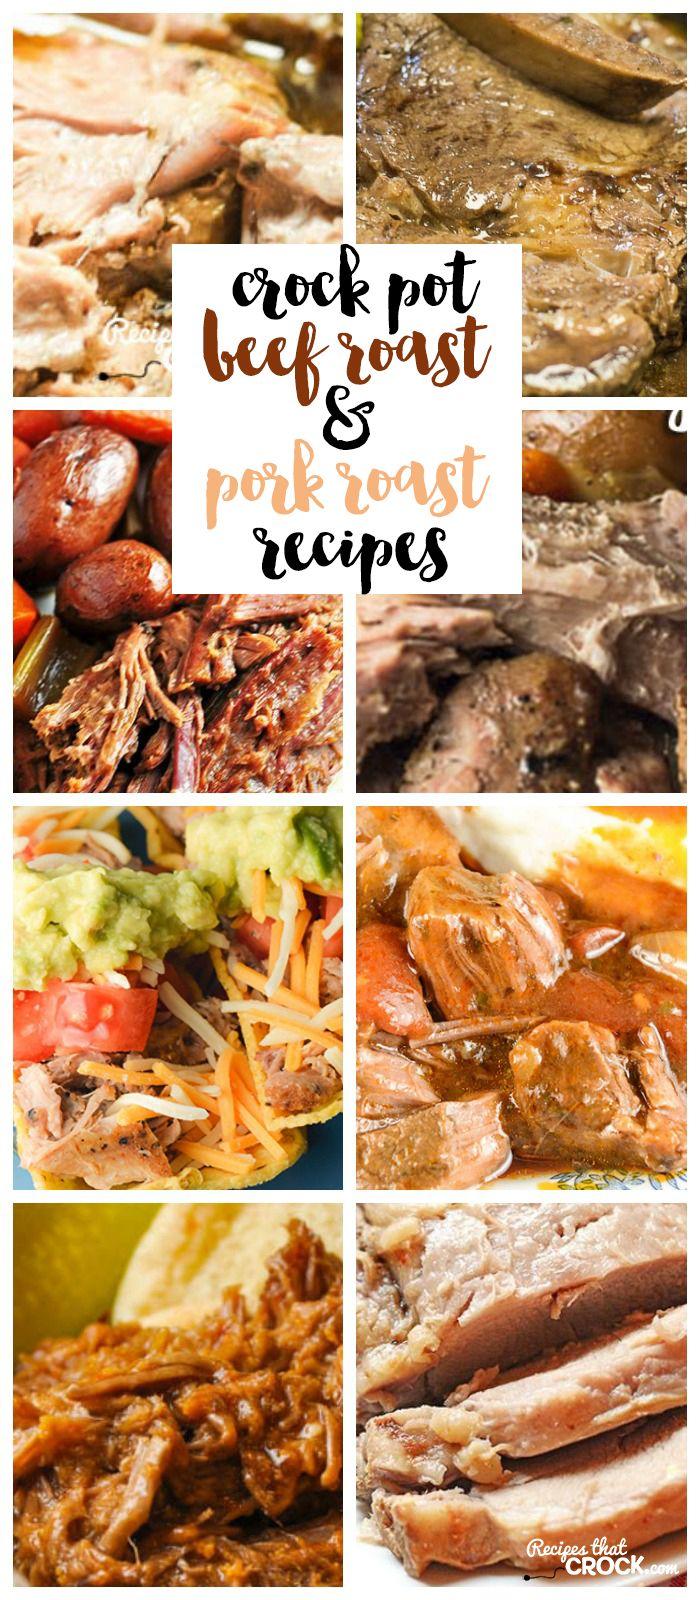 Crock Pot Beef Roast And Slow Cooker Pork Roast Recipes Pork Slow Cooker Pork Roast And Roast